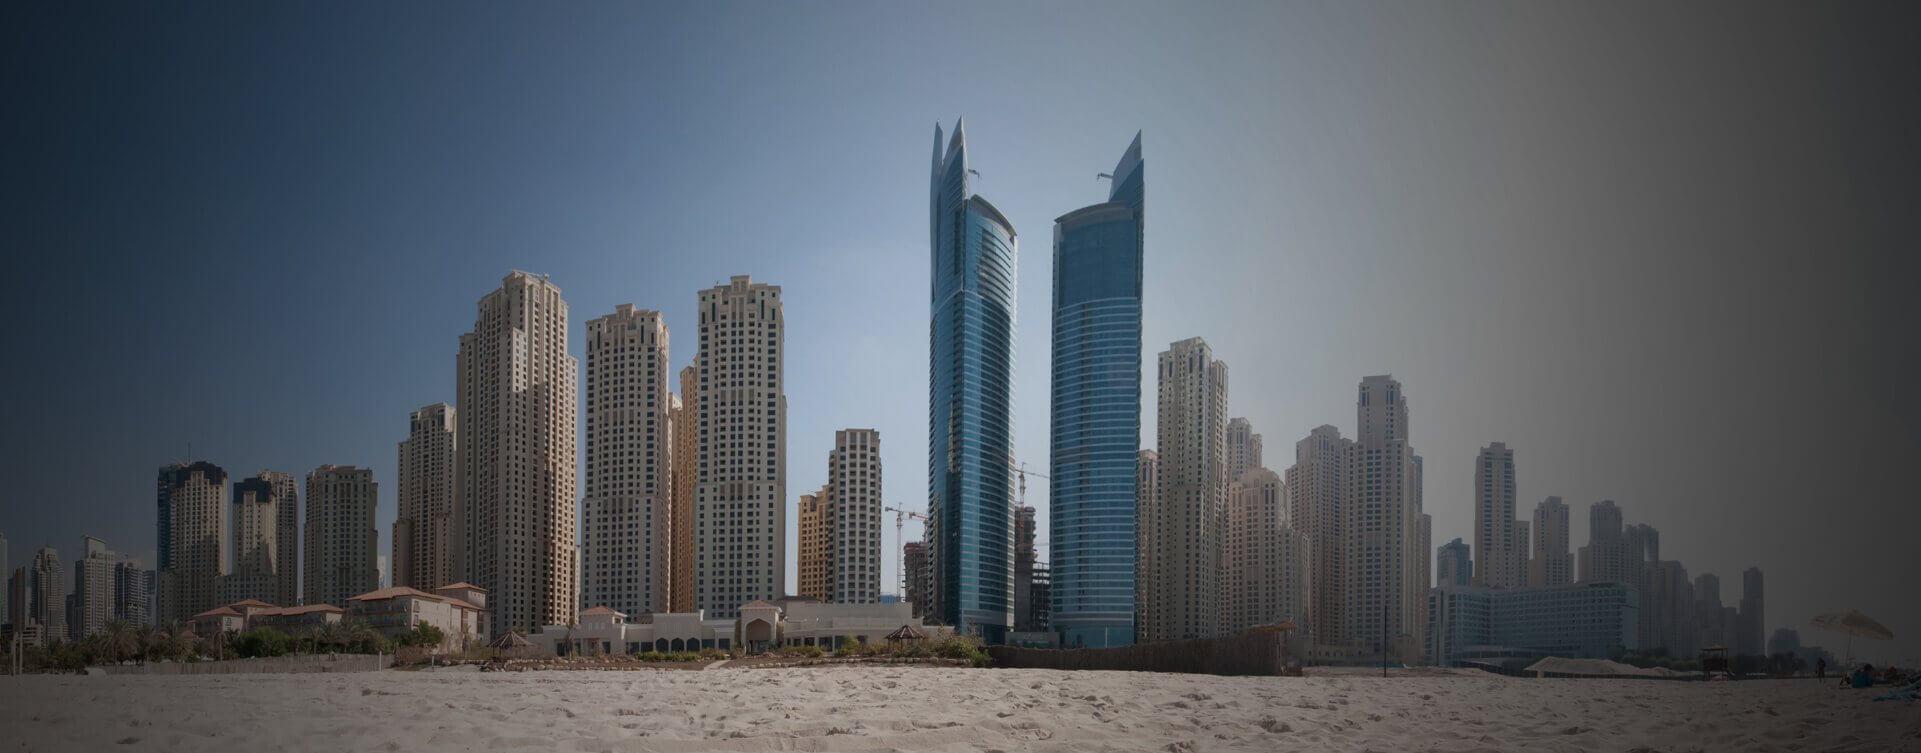 JA Oasis Beach Tower From Beach